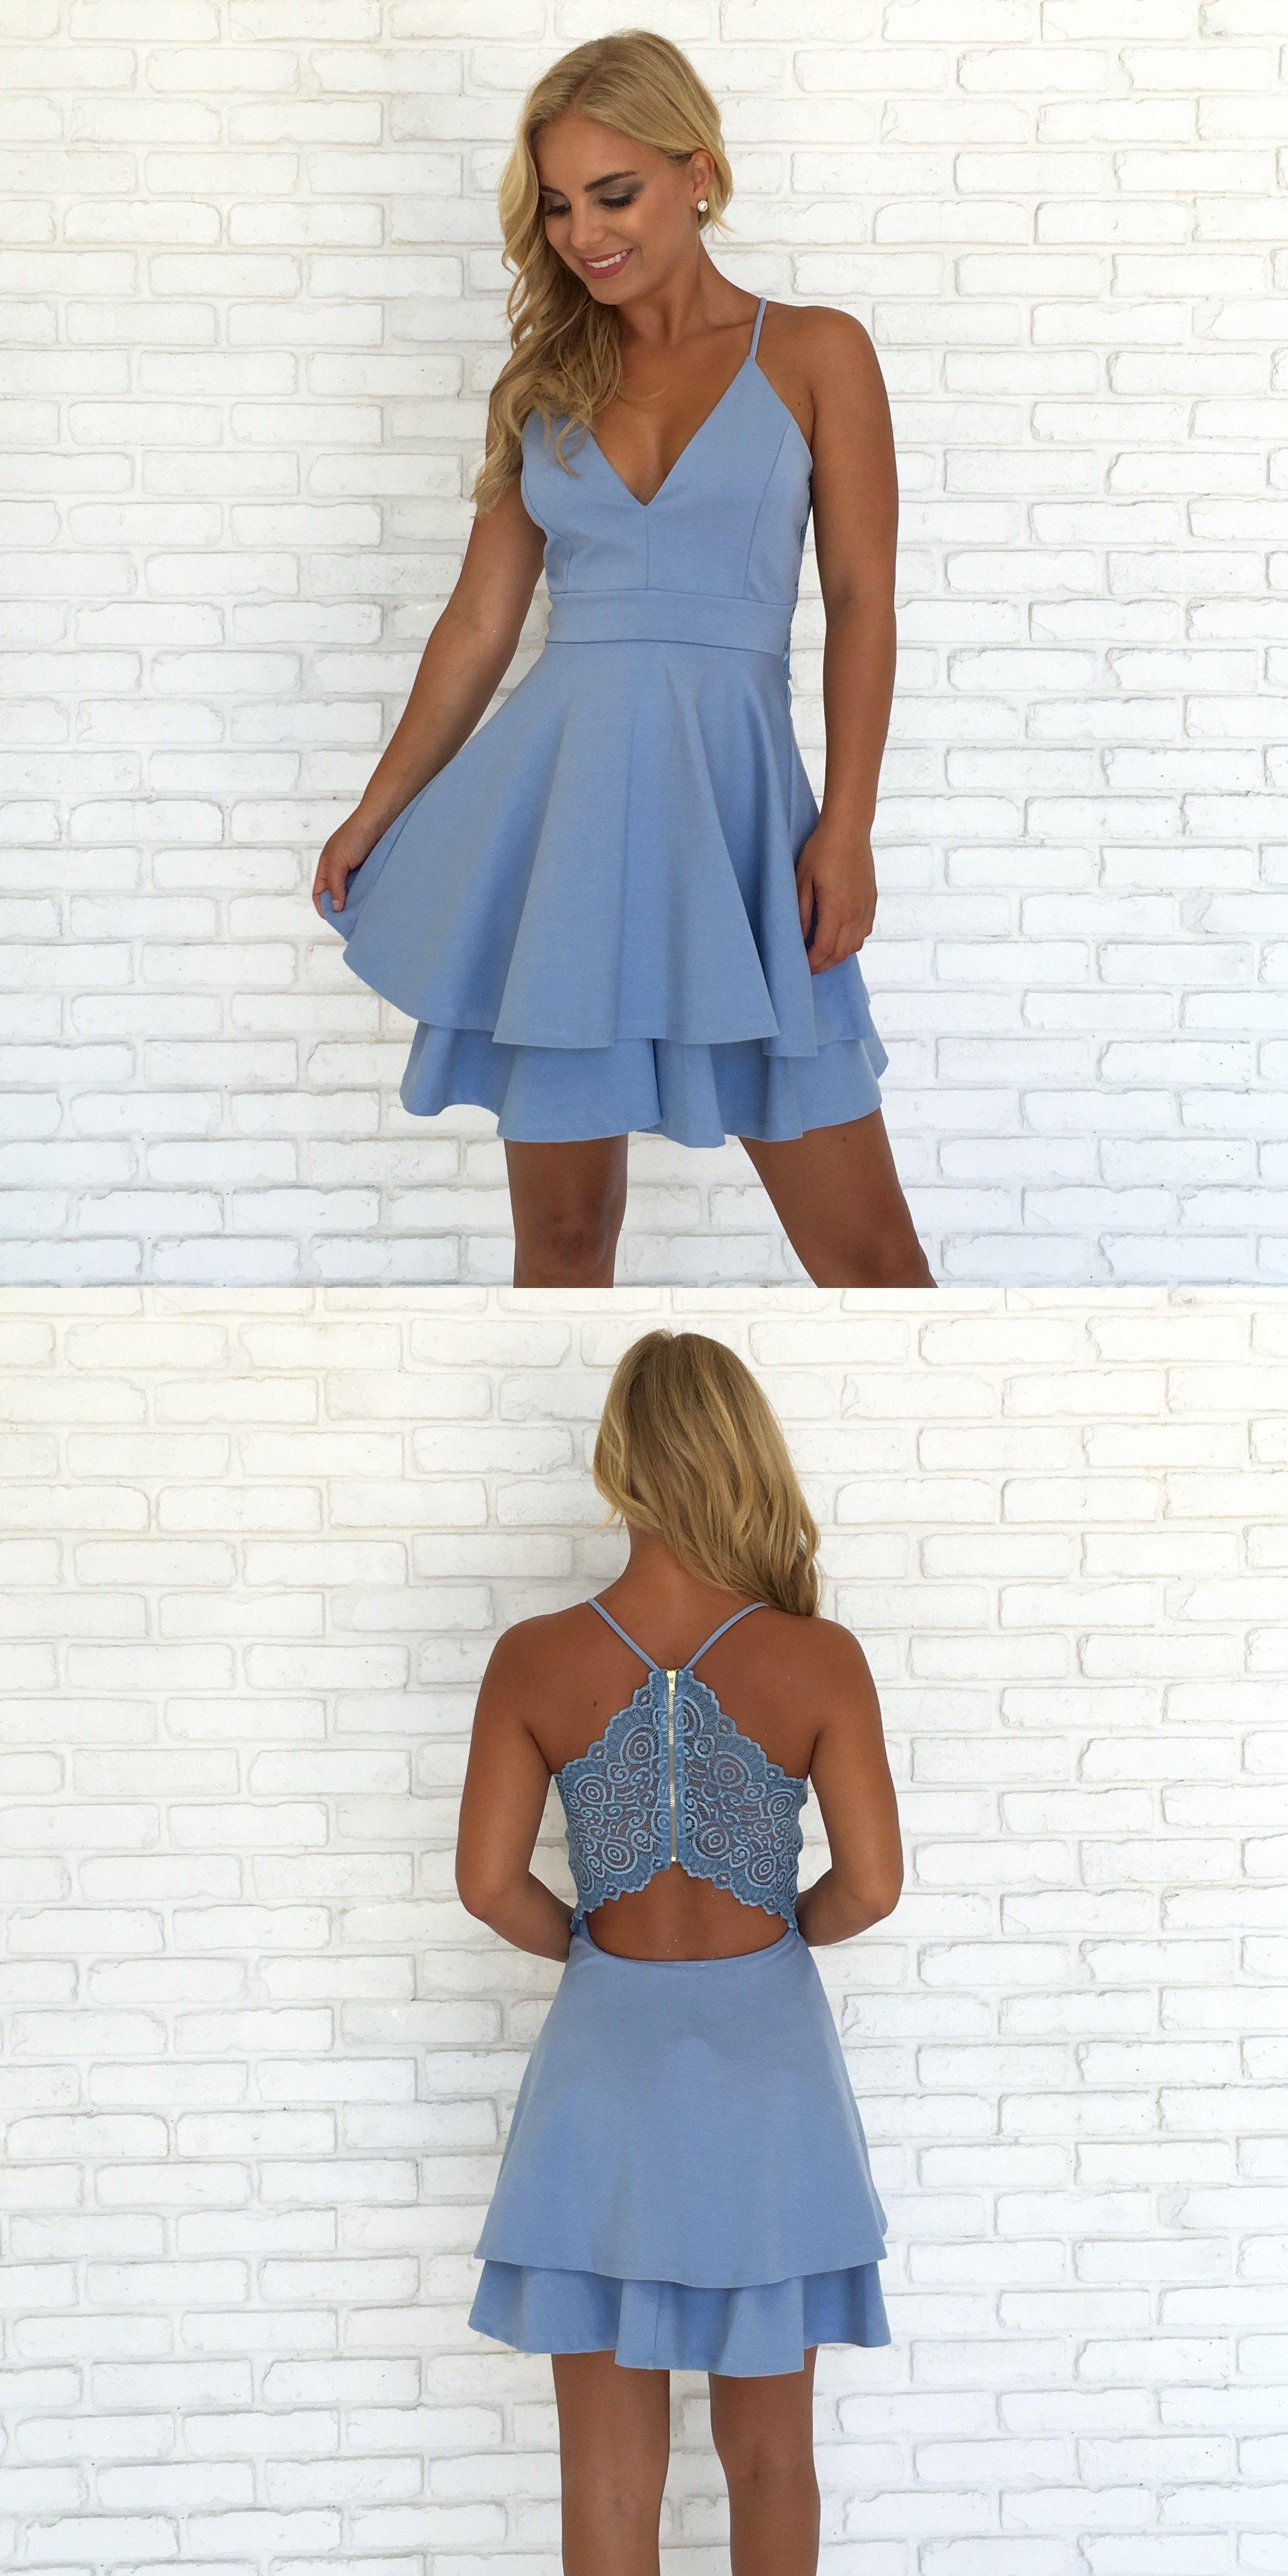 203d3a8beb47e blue short homecoming dress prom dress, straps short blue chiffon homecoming  dress with lace, party dress dancing dress